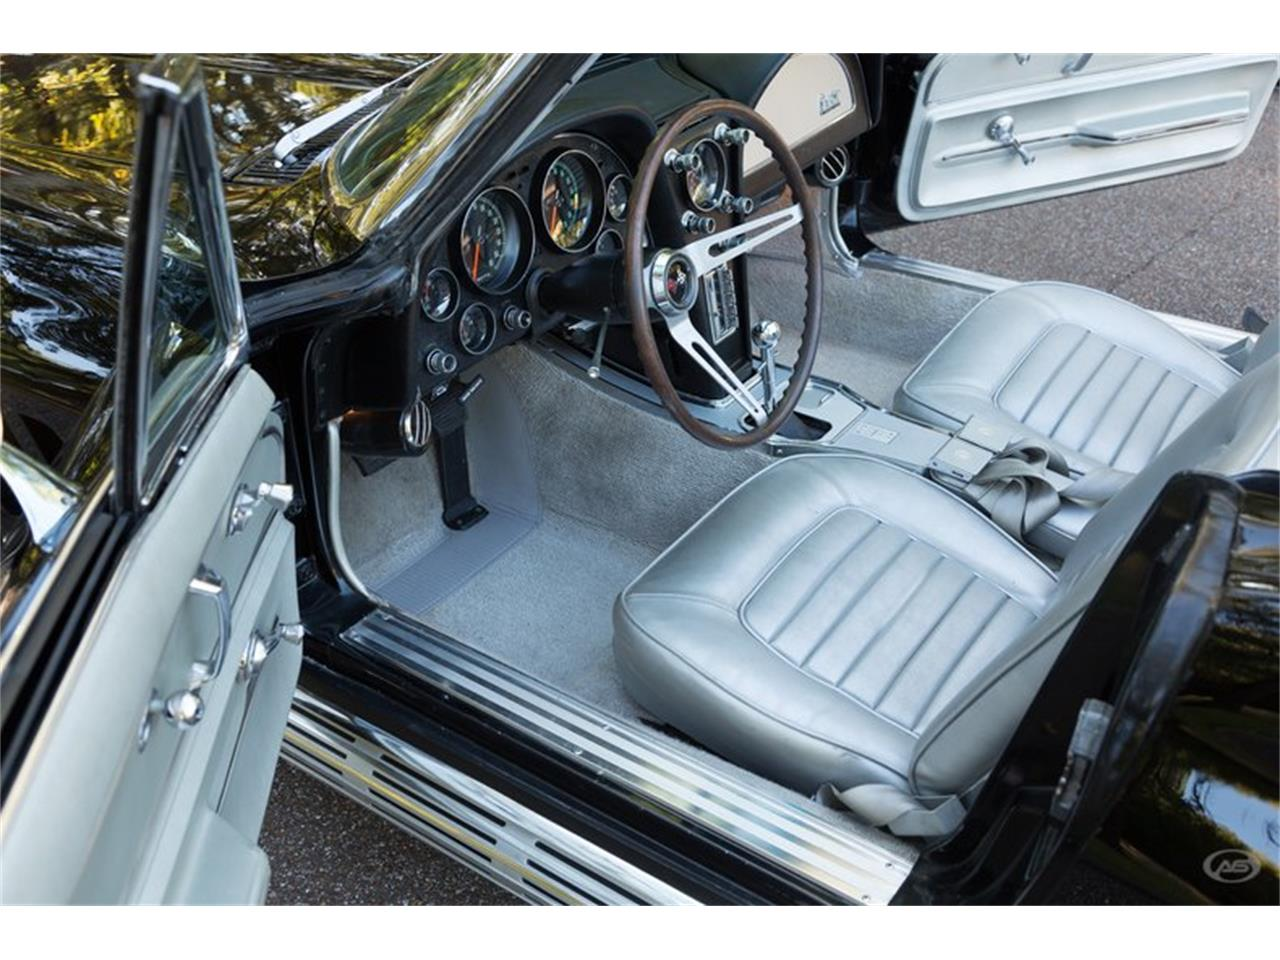 Large Picture of Classic '66 Chevrolet Corvette - $73,900.00 - JMLY